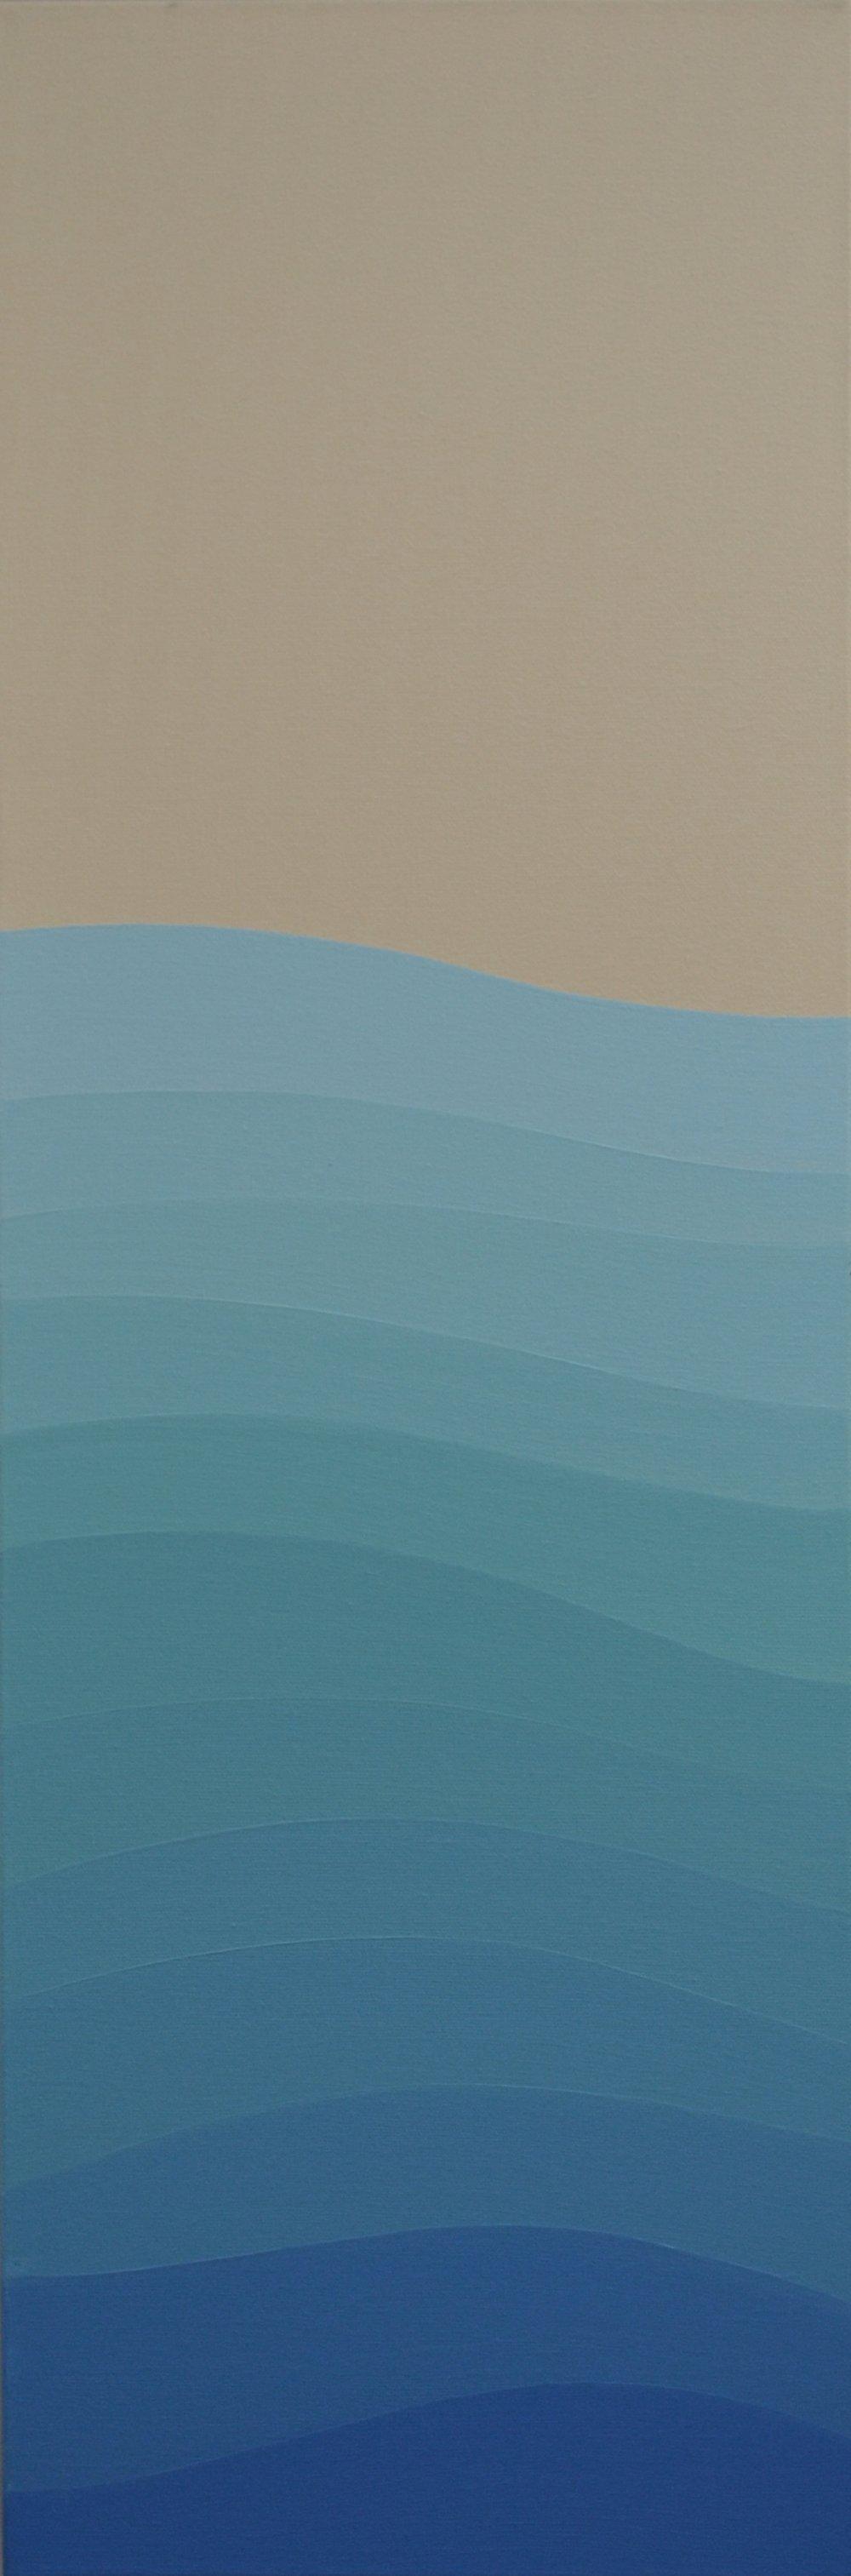 Armand Fogels-_Paradise_-12x36-oil-1st-2014-1500.00.jpg